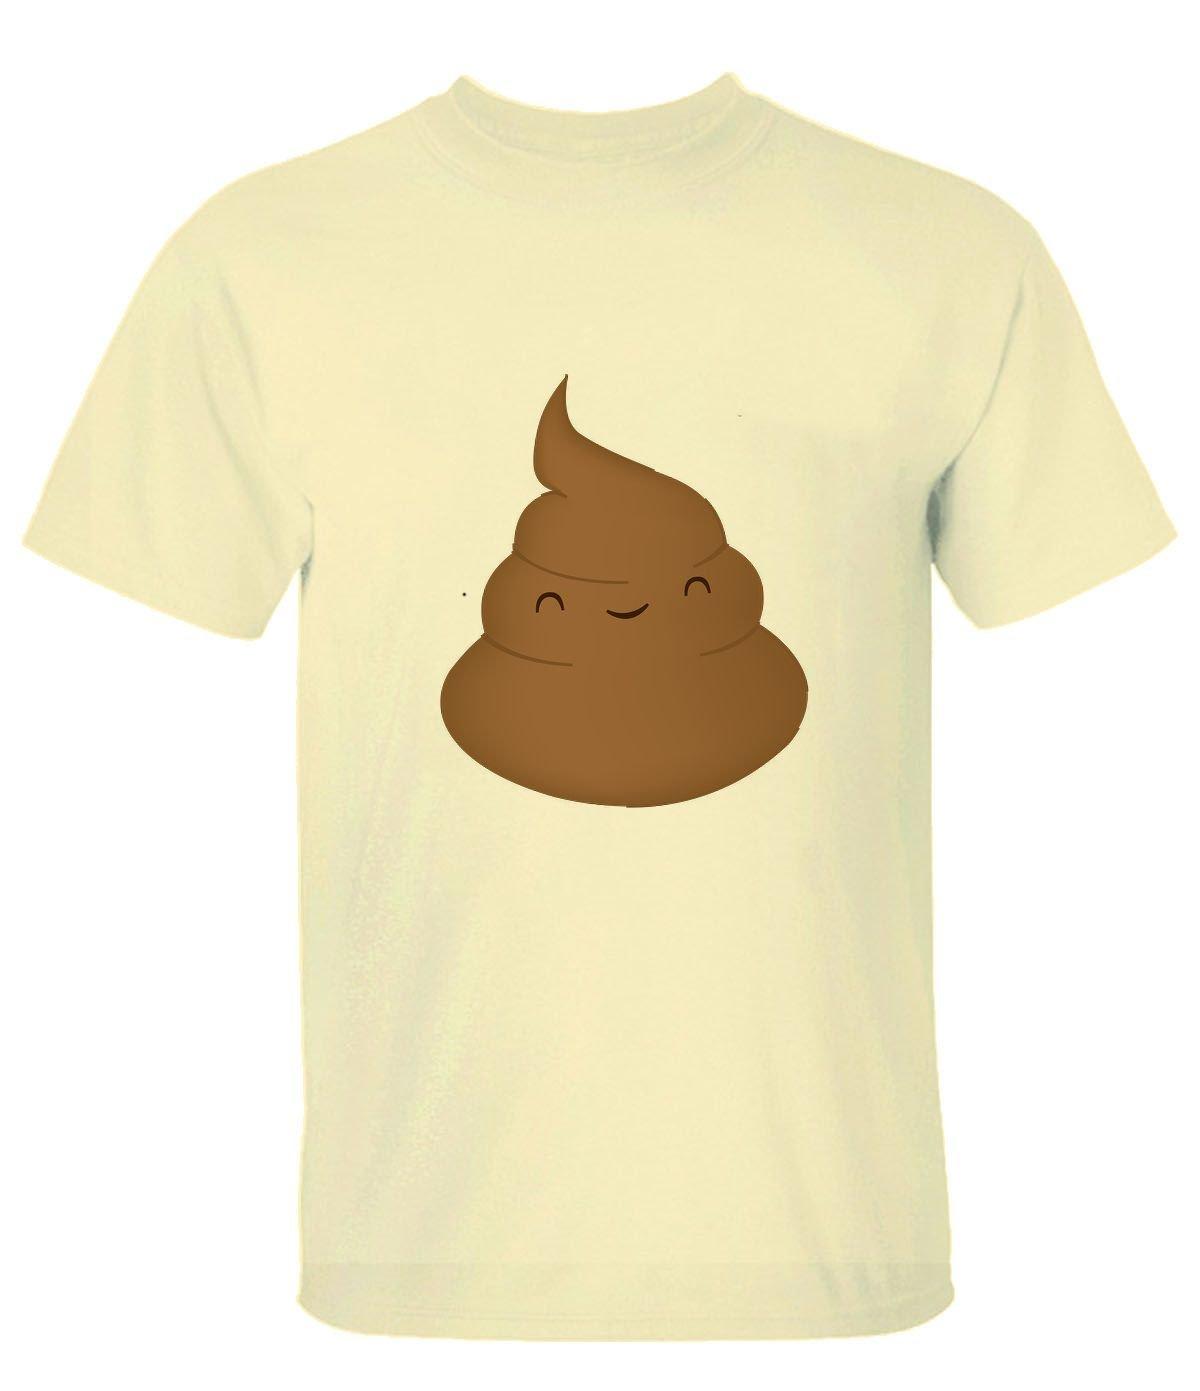 Zd215zd Cartoon Shit Man Logo T Shirt Ts For 5728